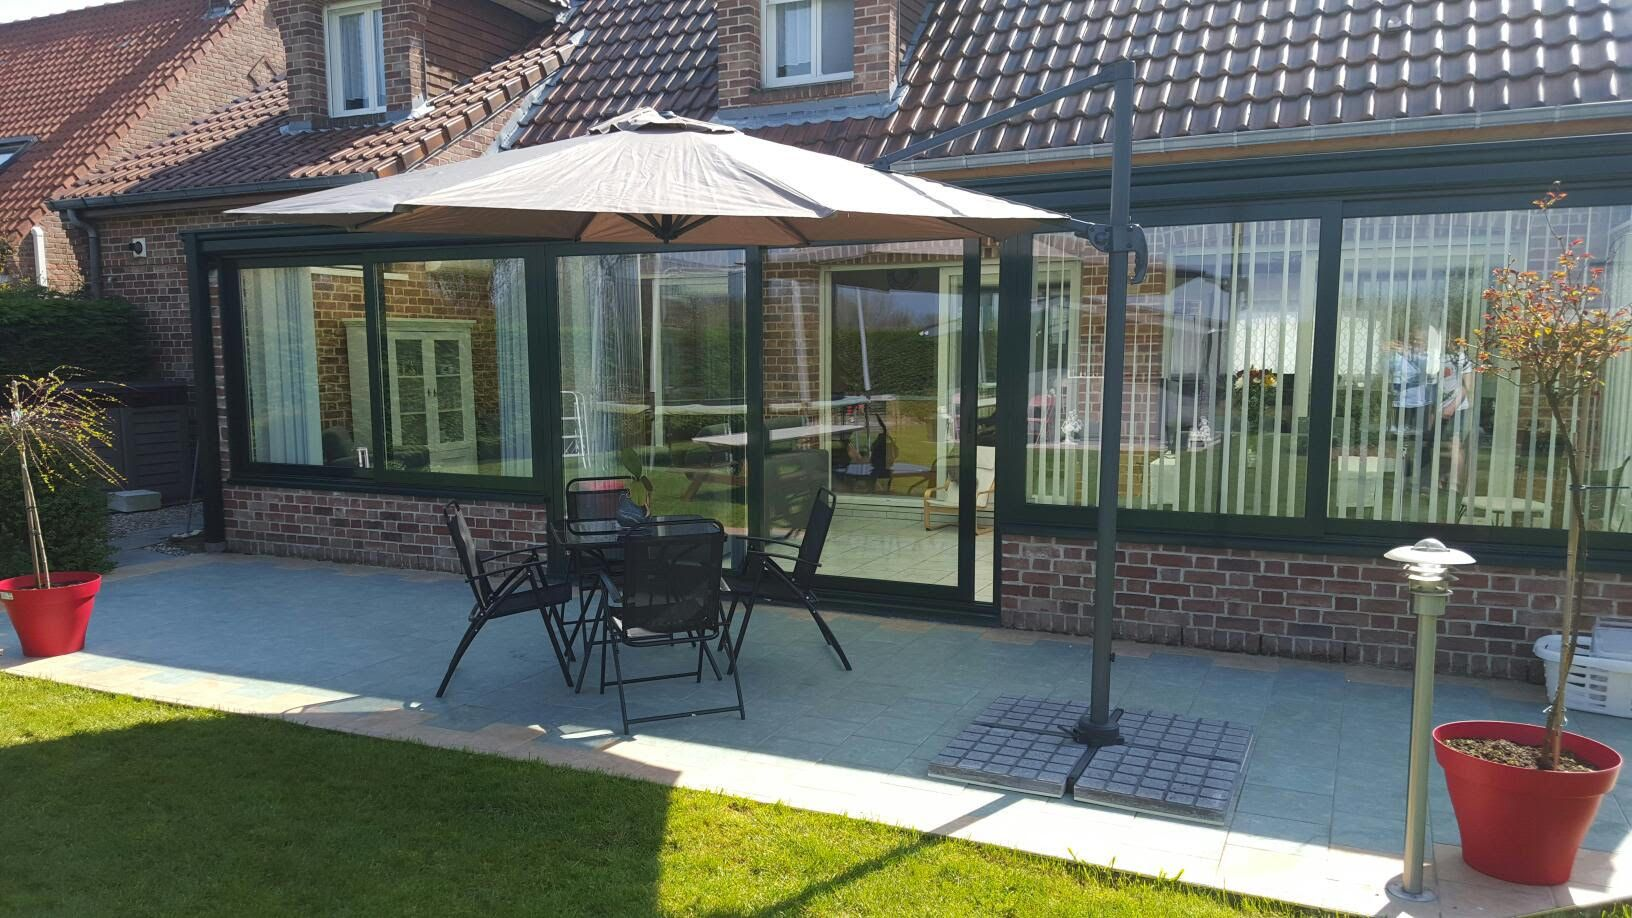 parasol terrasse best ronda parasol excentr with parasol terrasse amazing store de terrasse. Black Bedroom Furniture Sets. Home Design Ideas